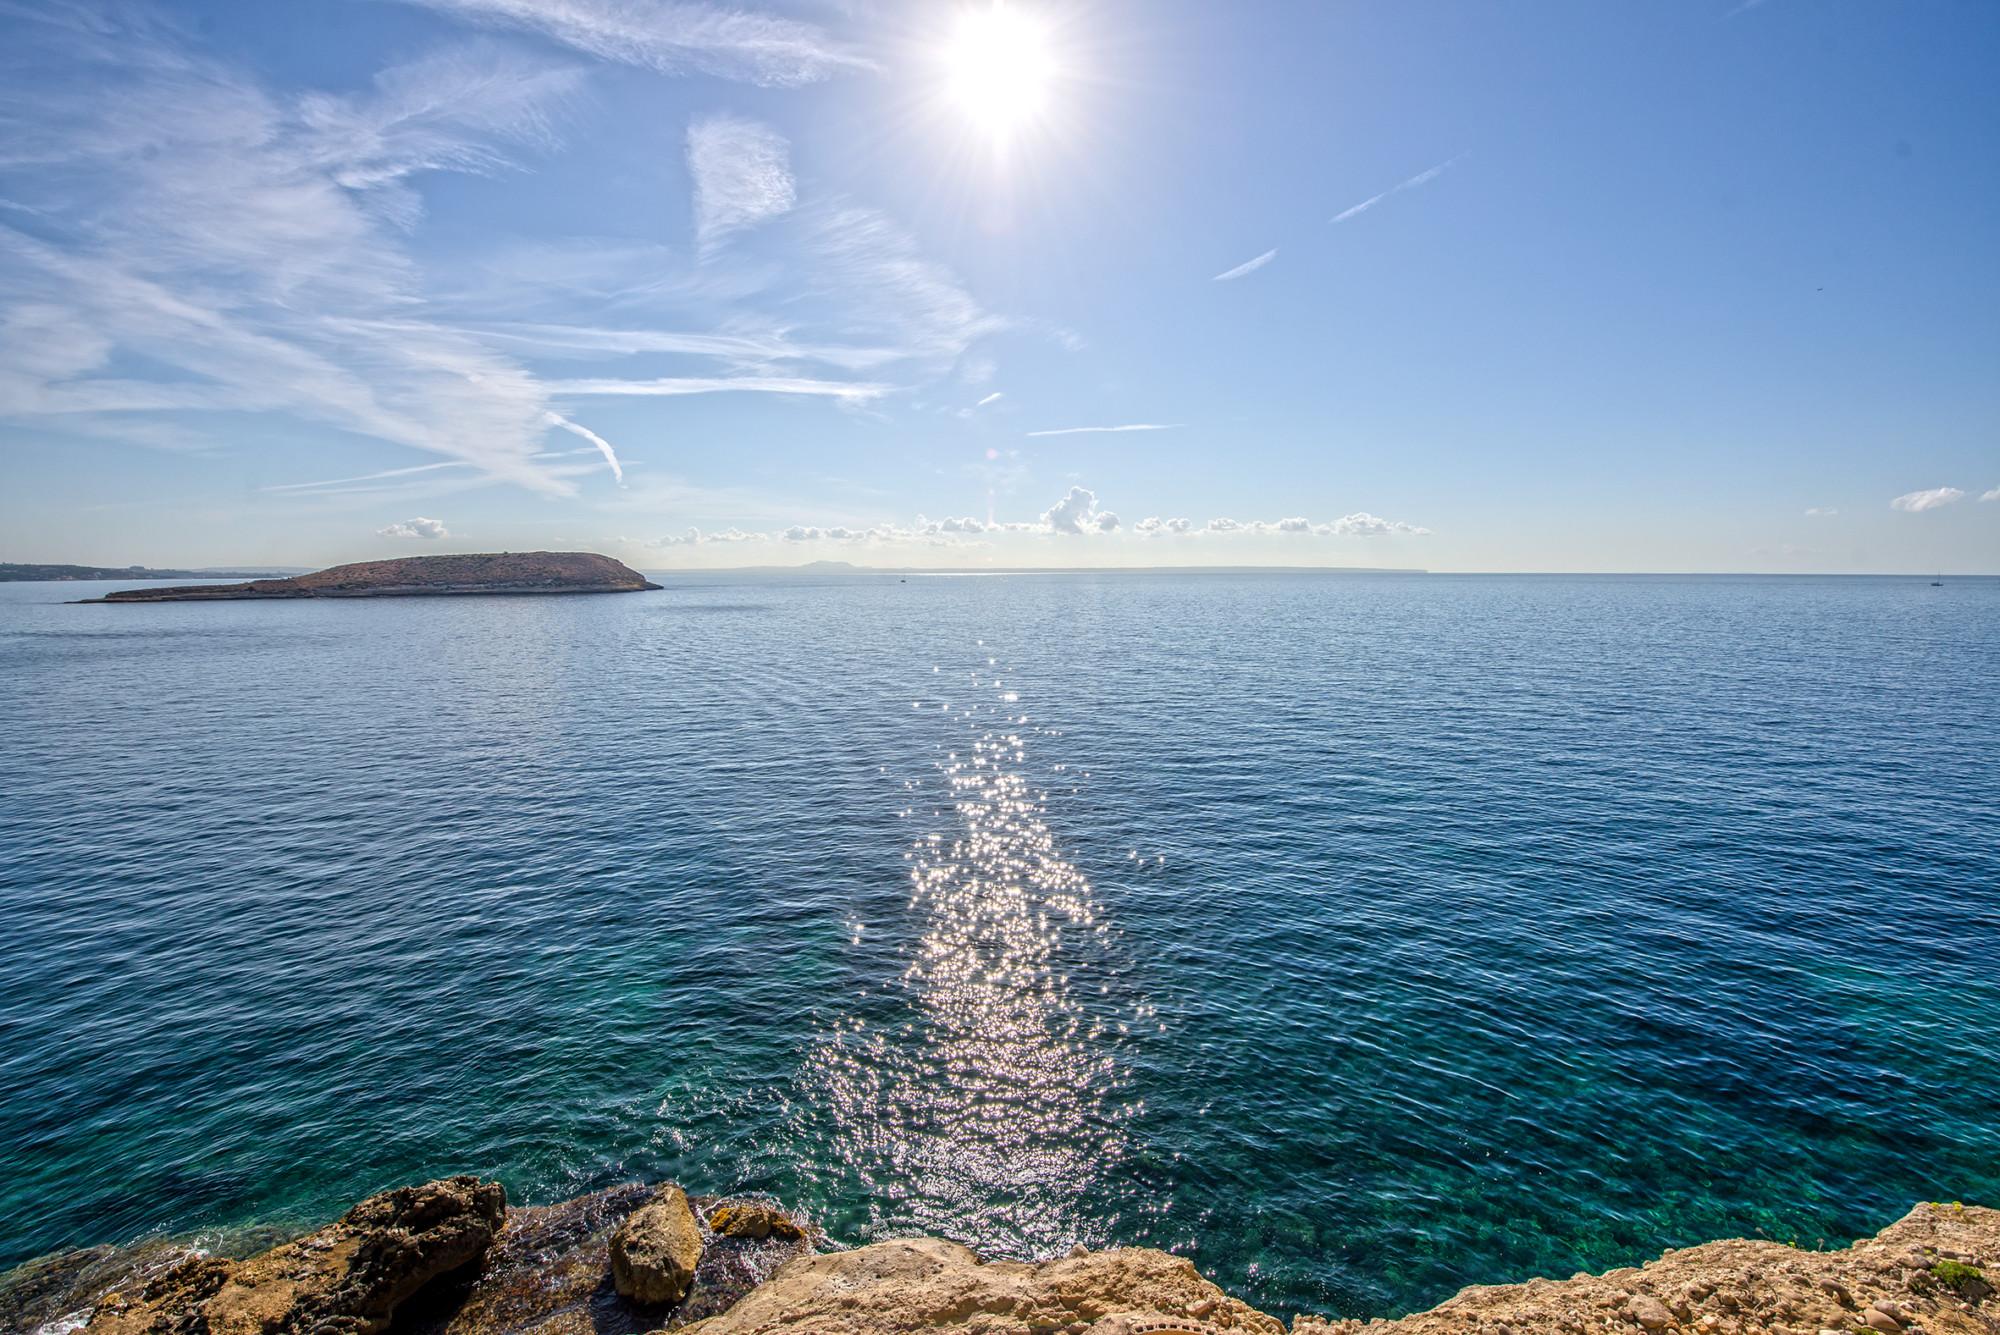 Meerzugang-Lebensqualität-Apartment-Meerblick-Mallorca